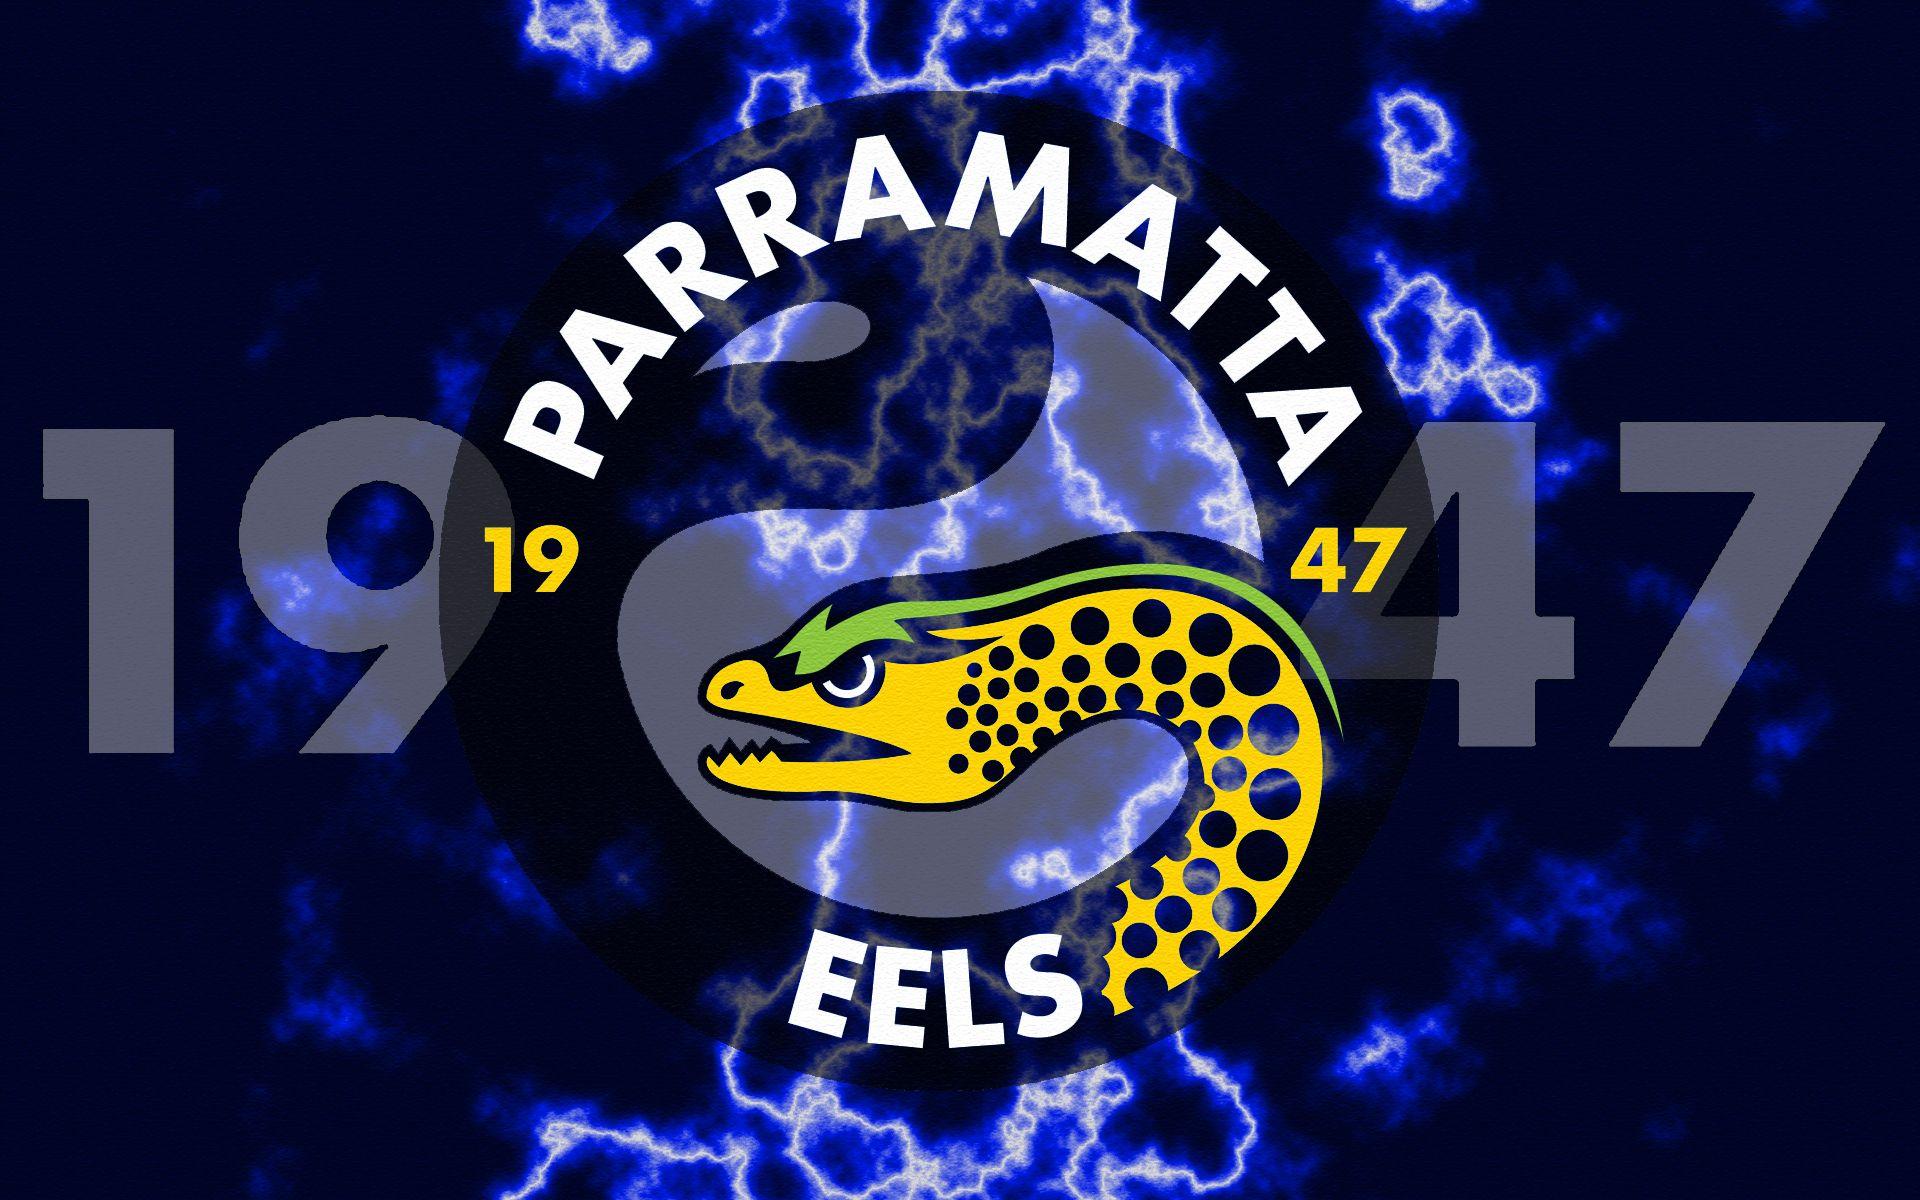 Parramatta Eels 1947 Lightning Wallpaper By Sunnyboiiii National Rugby League Nrl Memes Nrl